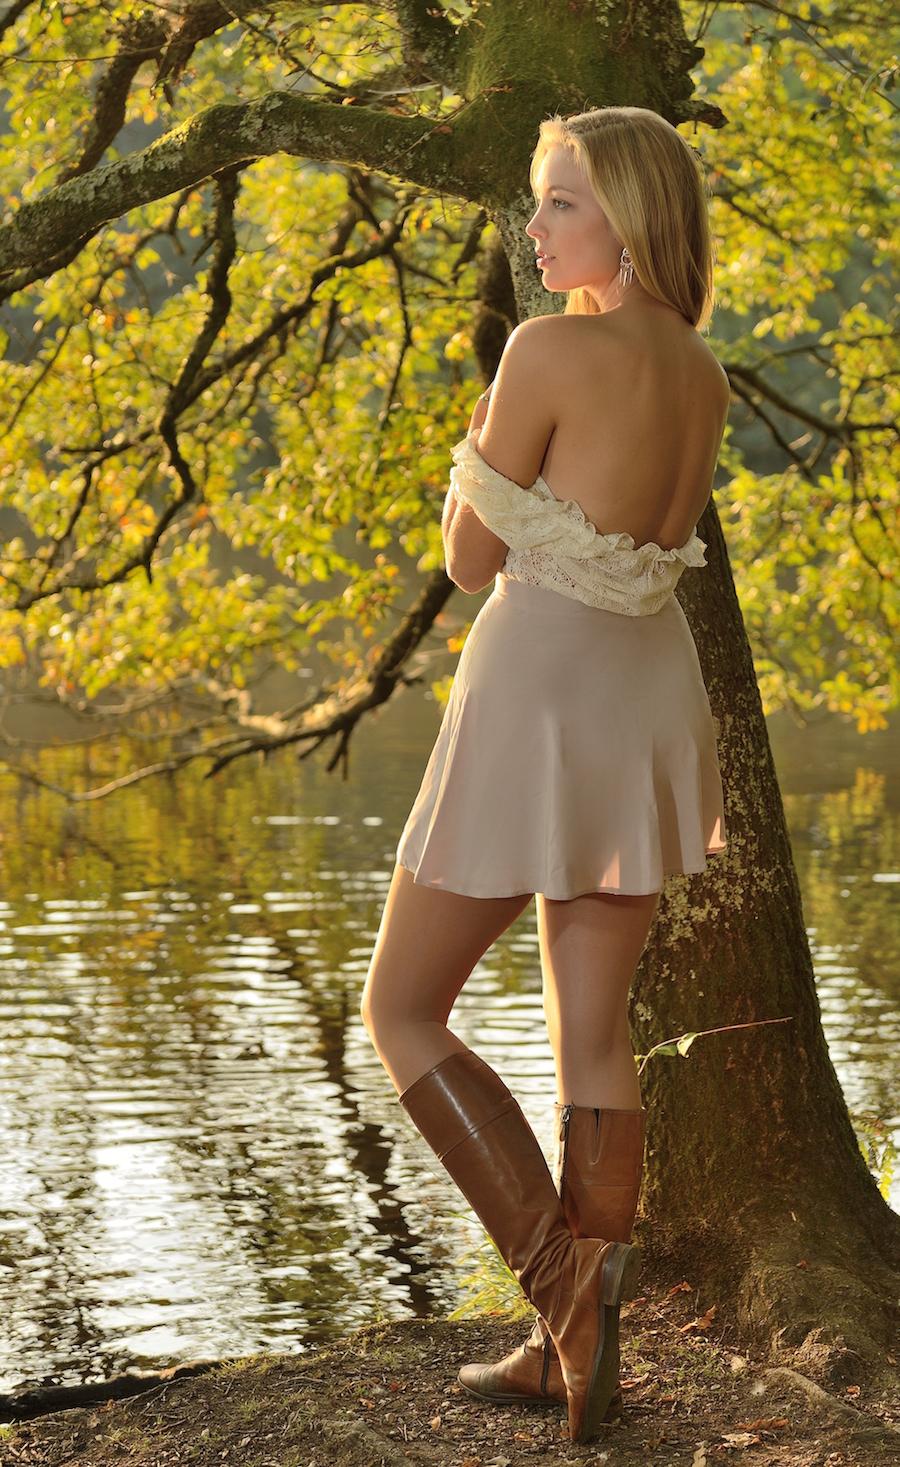 Where The Wild Roses Grow / Model Amalia / Uploaded 11th September 2014 @ 10:16 PM